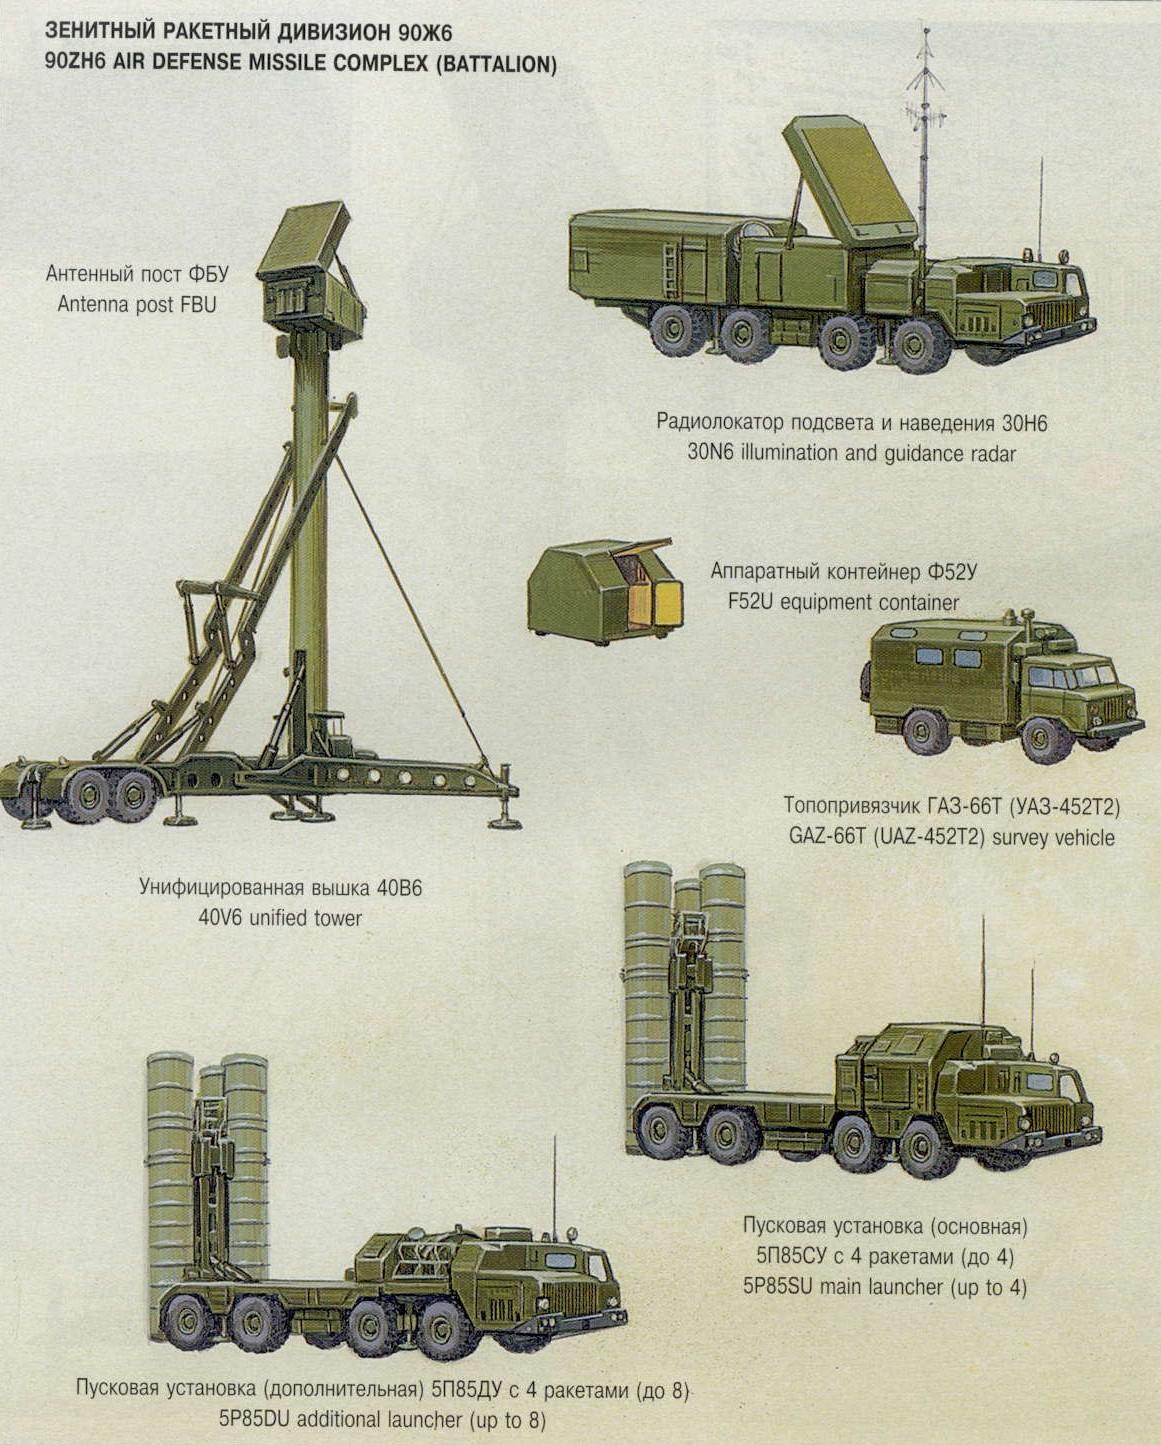 S 300 missile systems vs patriot - S 300 Missile Systems Vs Patriot 5